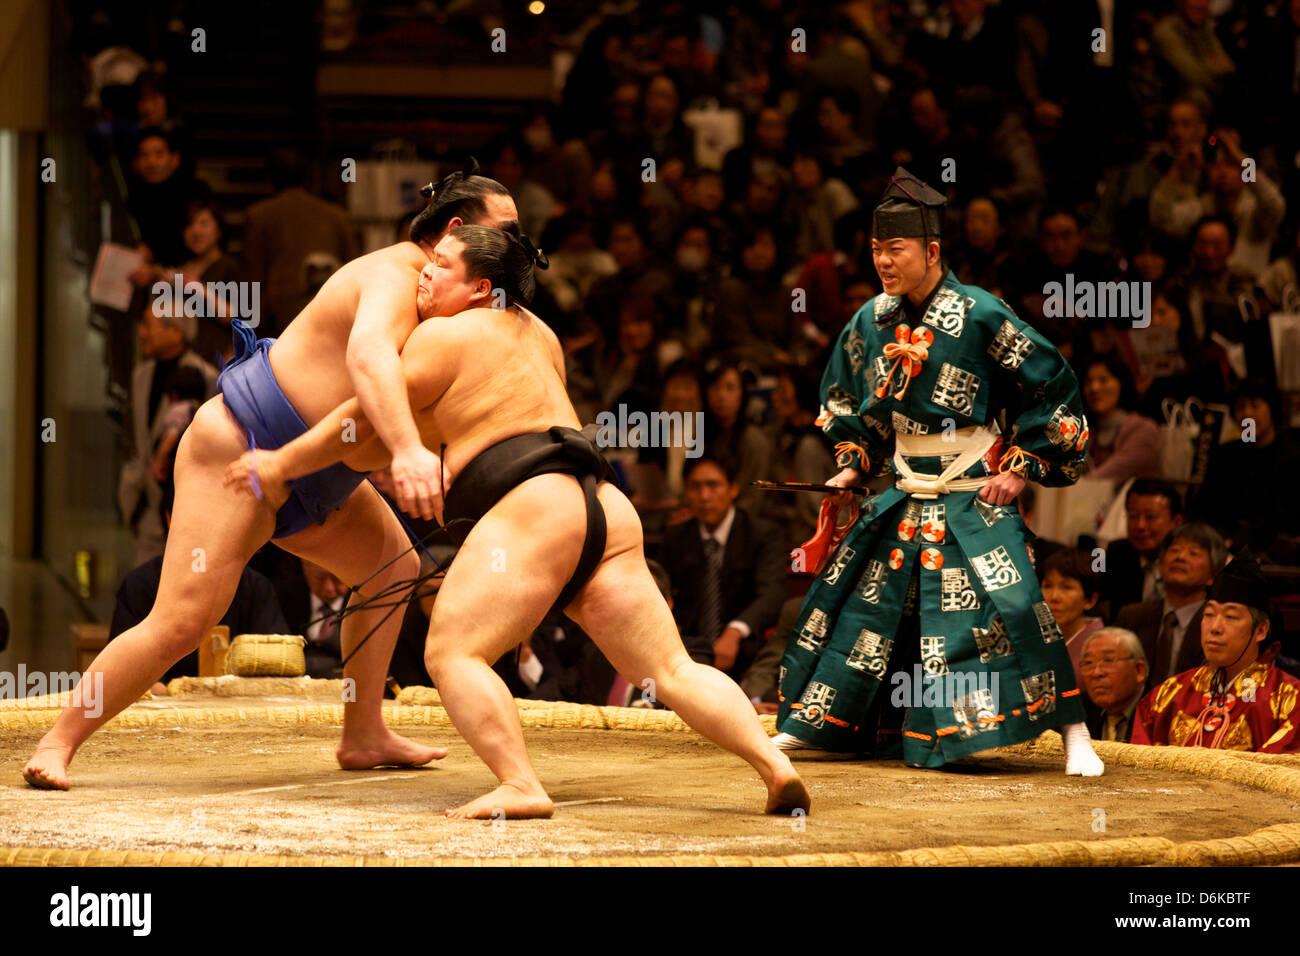 Two sumo wrestlers fighting at the Kokugikan stadium, Tokyo, Japan, Asia - Stock Image